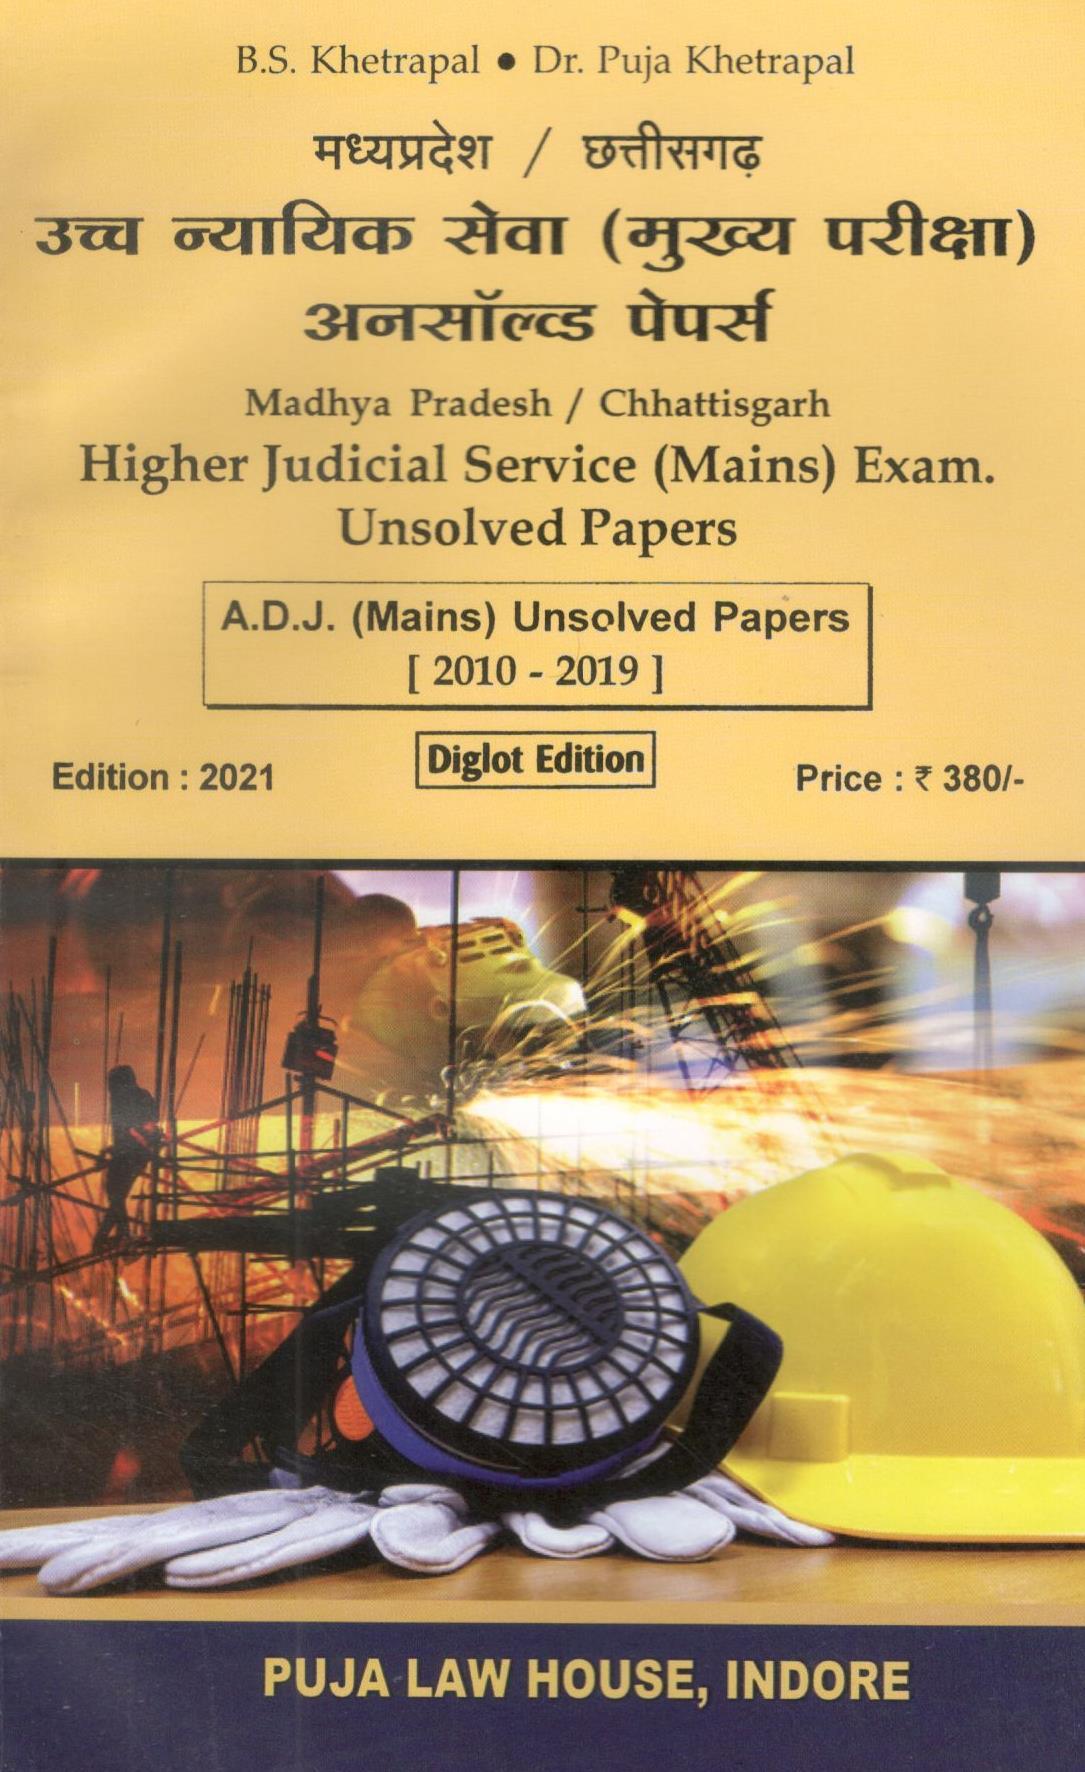 म.प�र./छ.ग. उच�च न�यायिक सेवा (म�ख�य परीक�षा) अनसॉल�व�ड पेपर�स - Madhya Pradesh / Chhattisgarh Higher Judicial Service (Mains) Exam. Unsolved Papers (2010-2019)